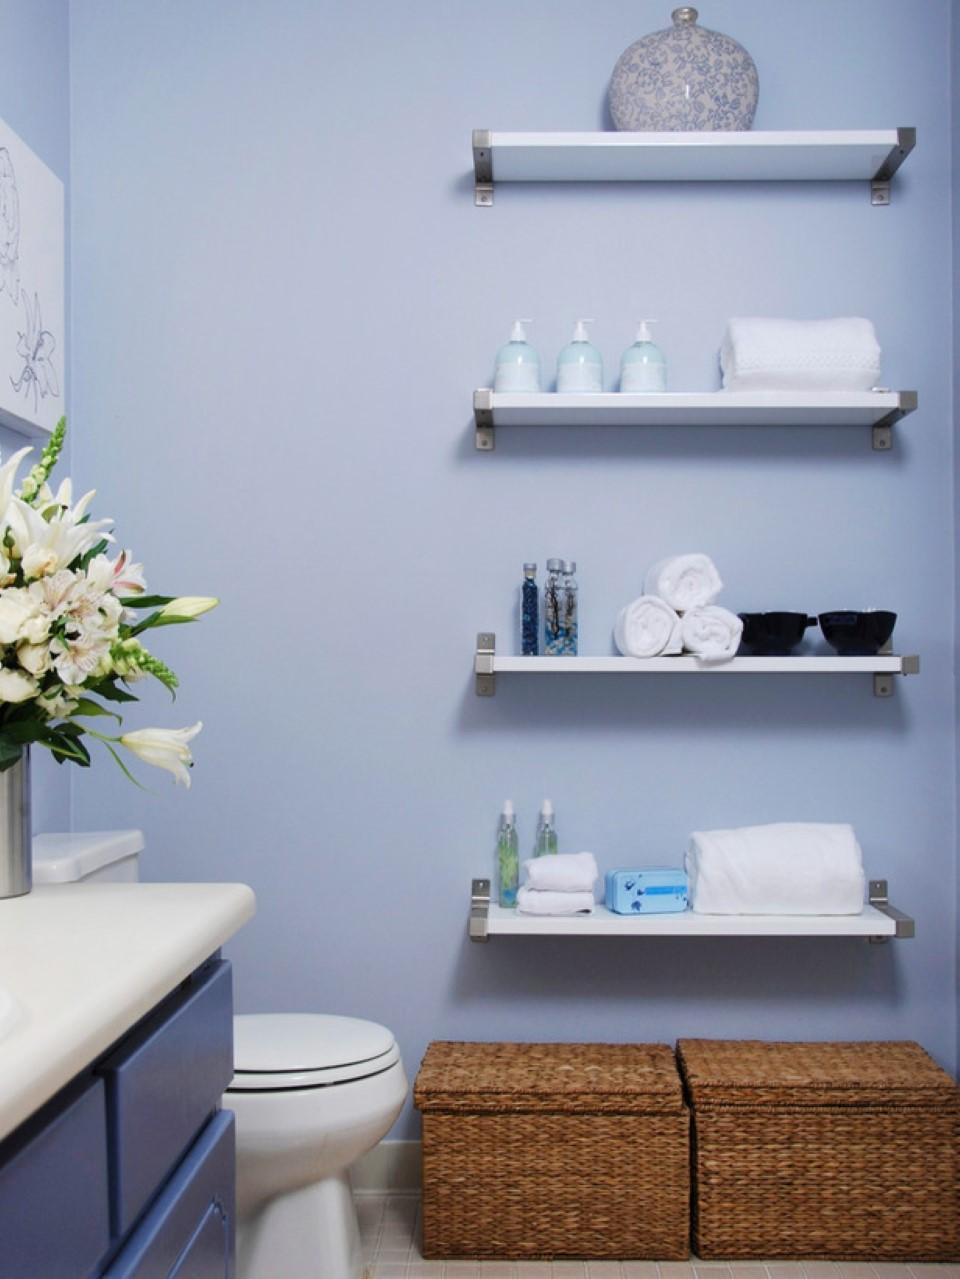 Best Bathroom Wall Shelving Idea to Adorn Your Room   HomesFeed